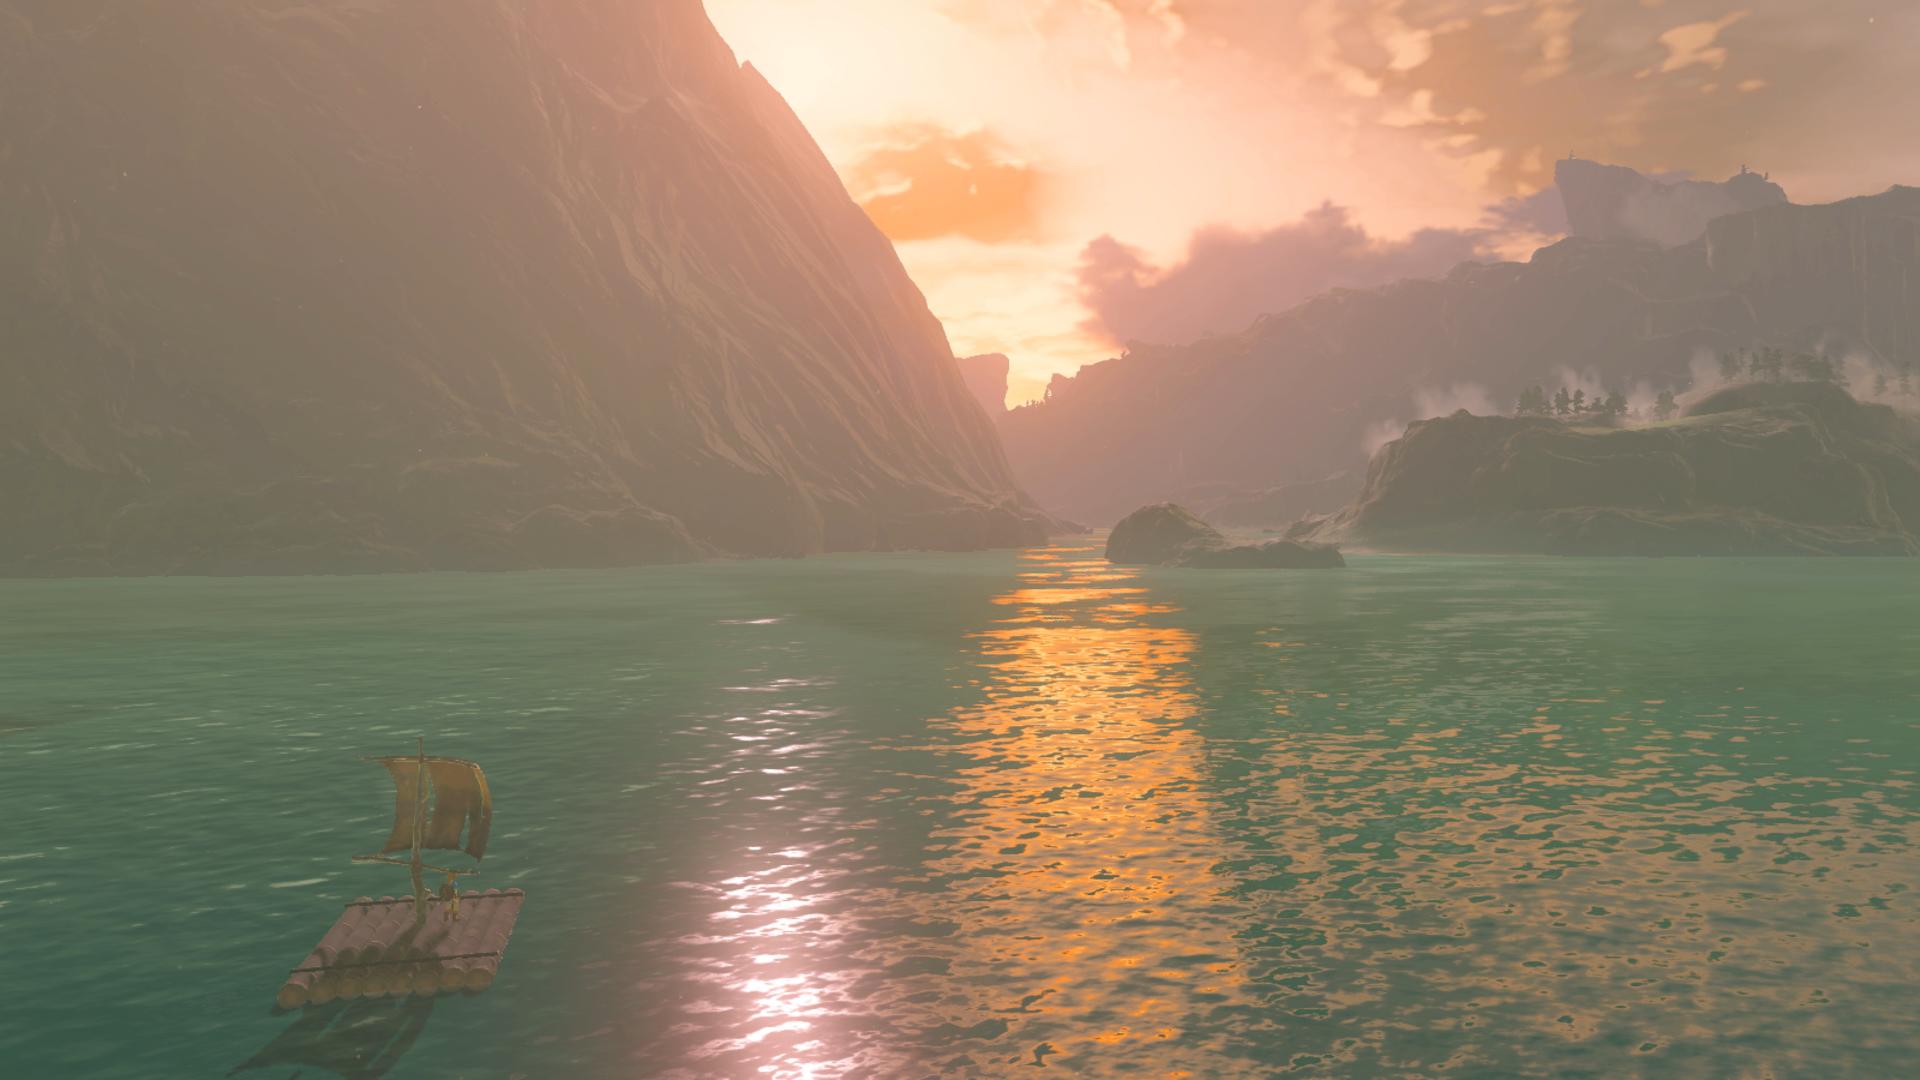 The Legend of Zelda: Breath of the Wild image 30